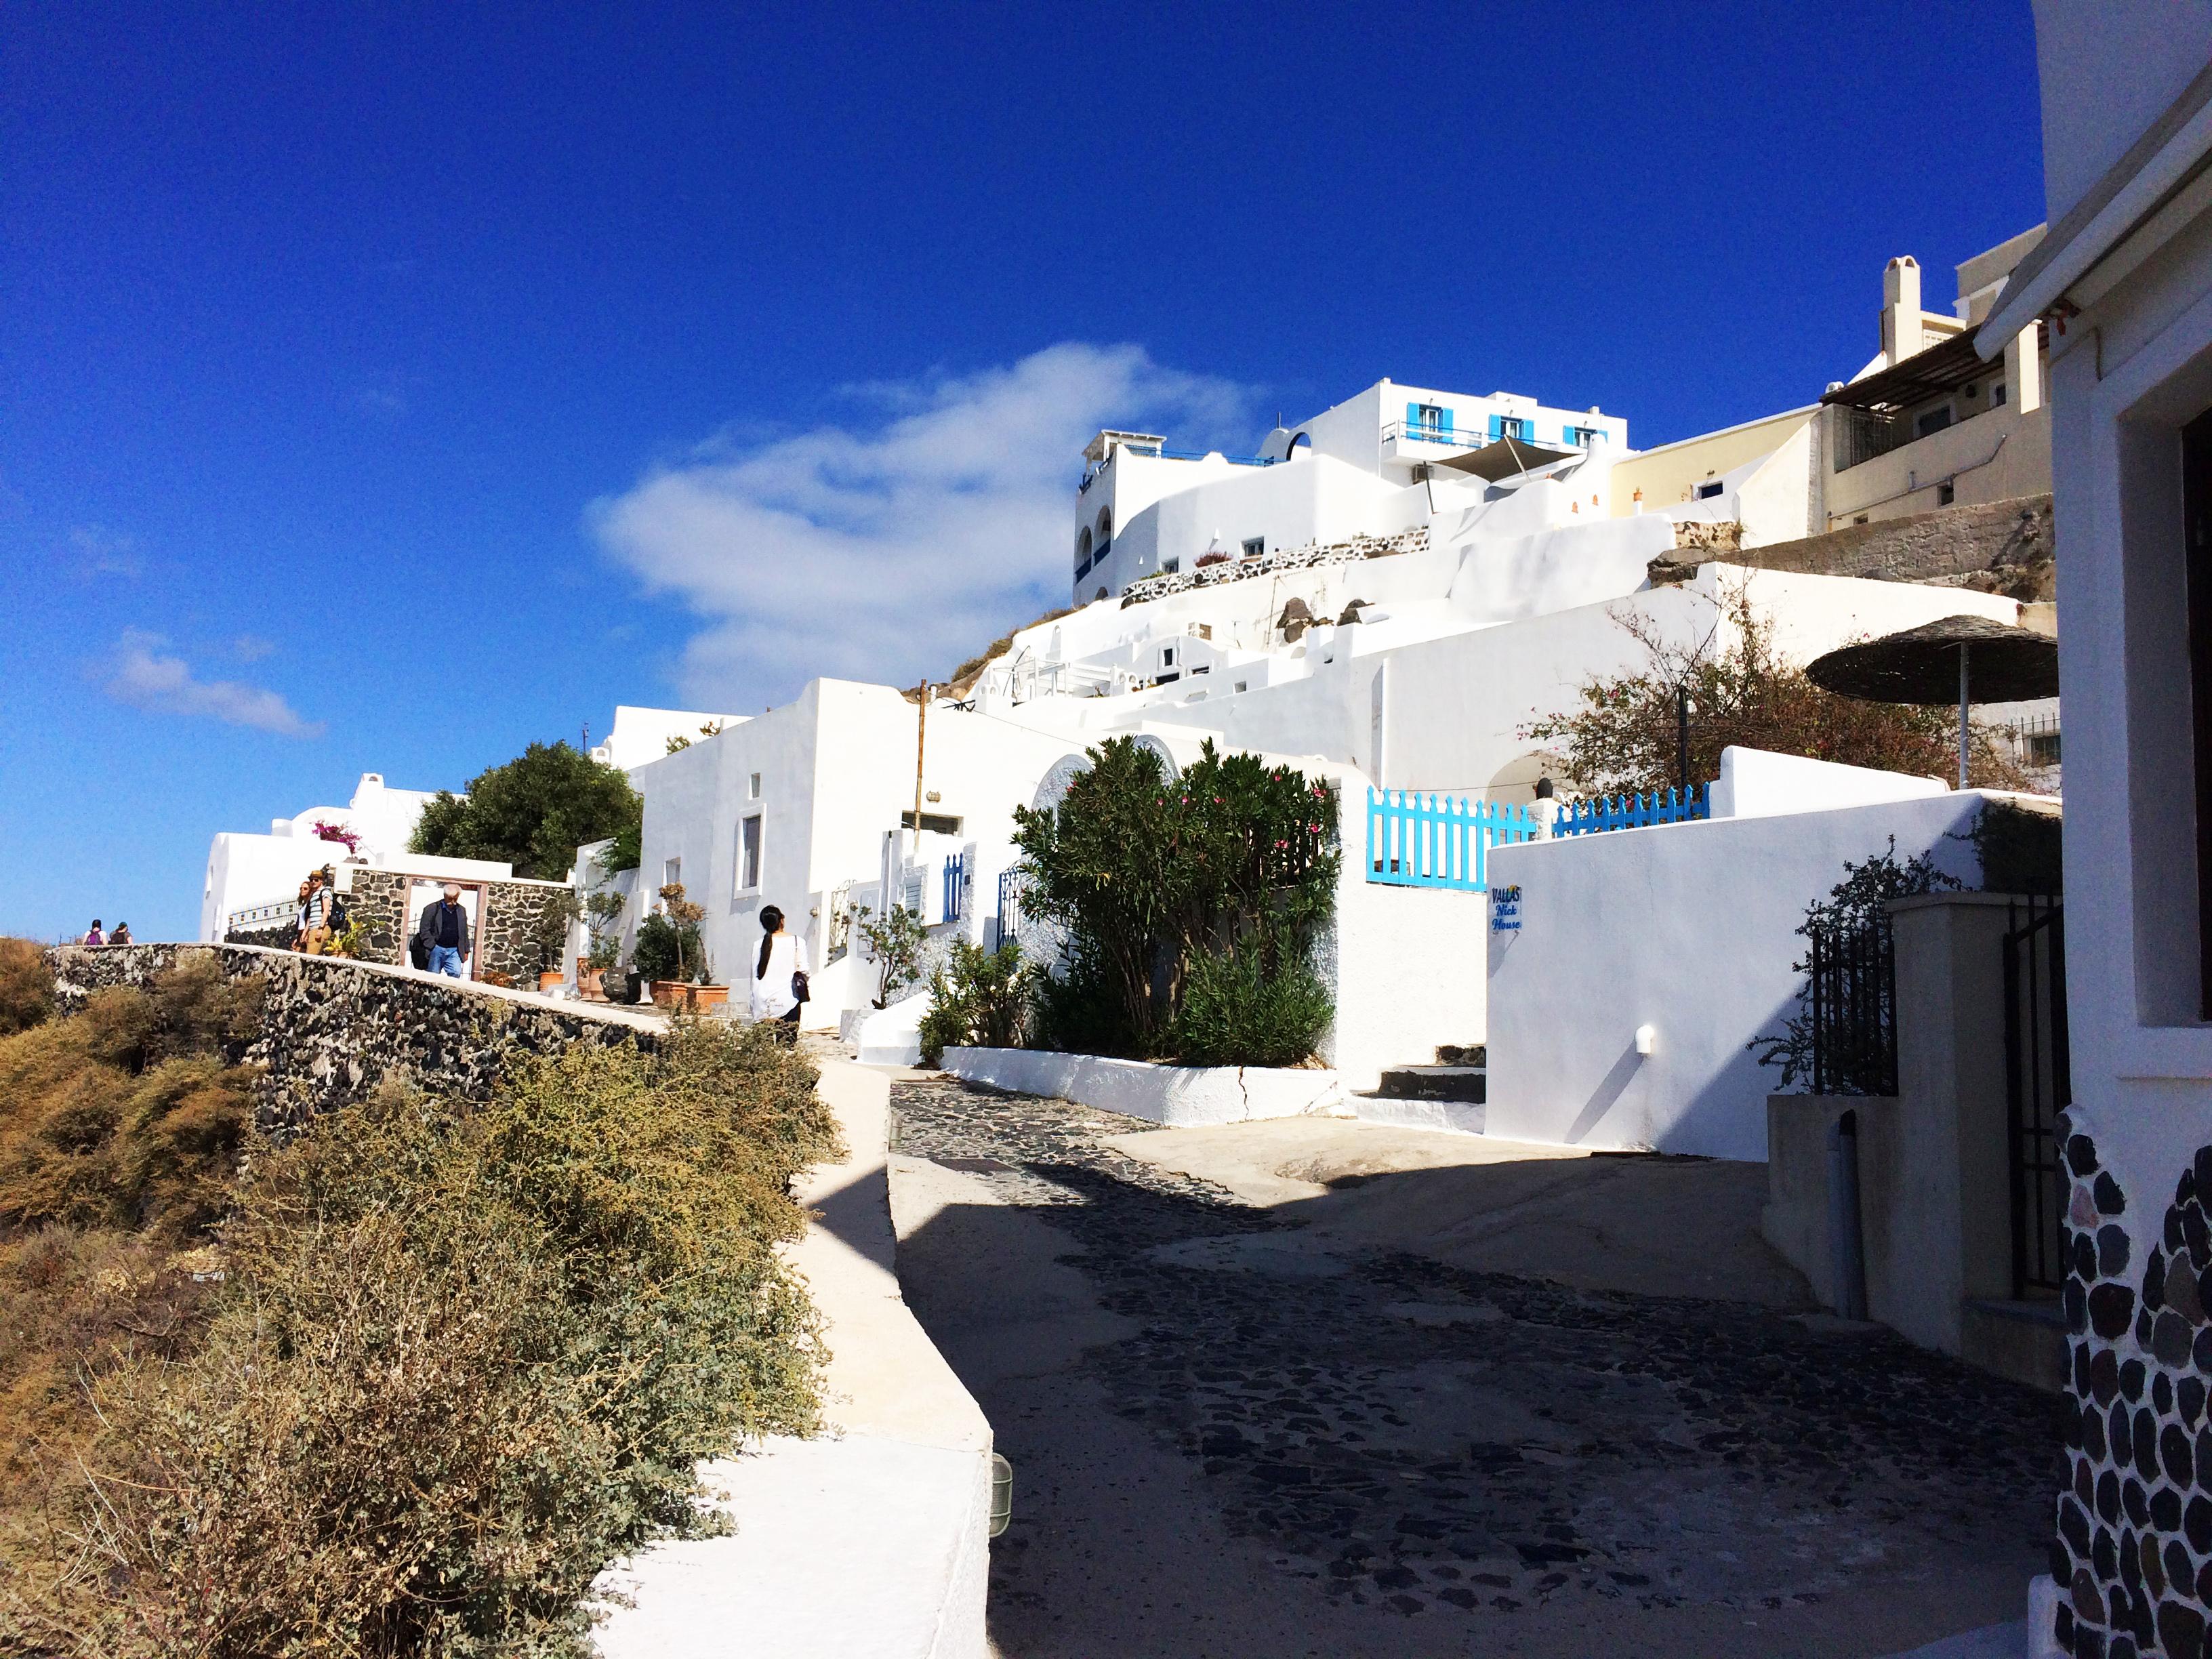 ulica Santorini Grčka